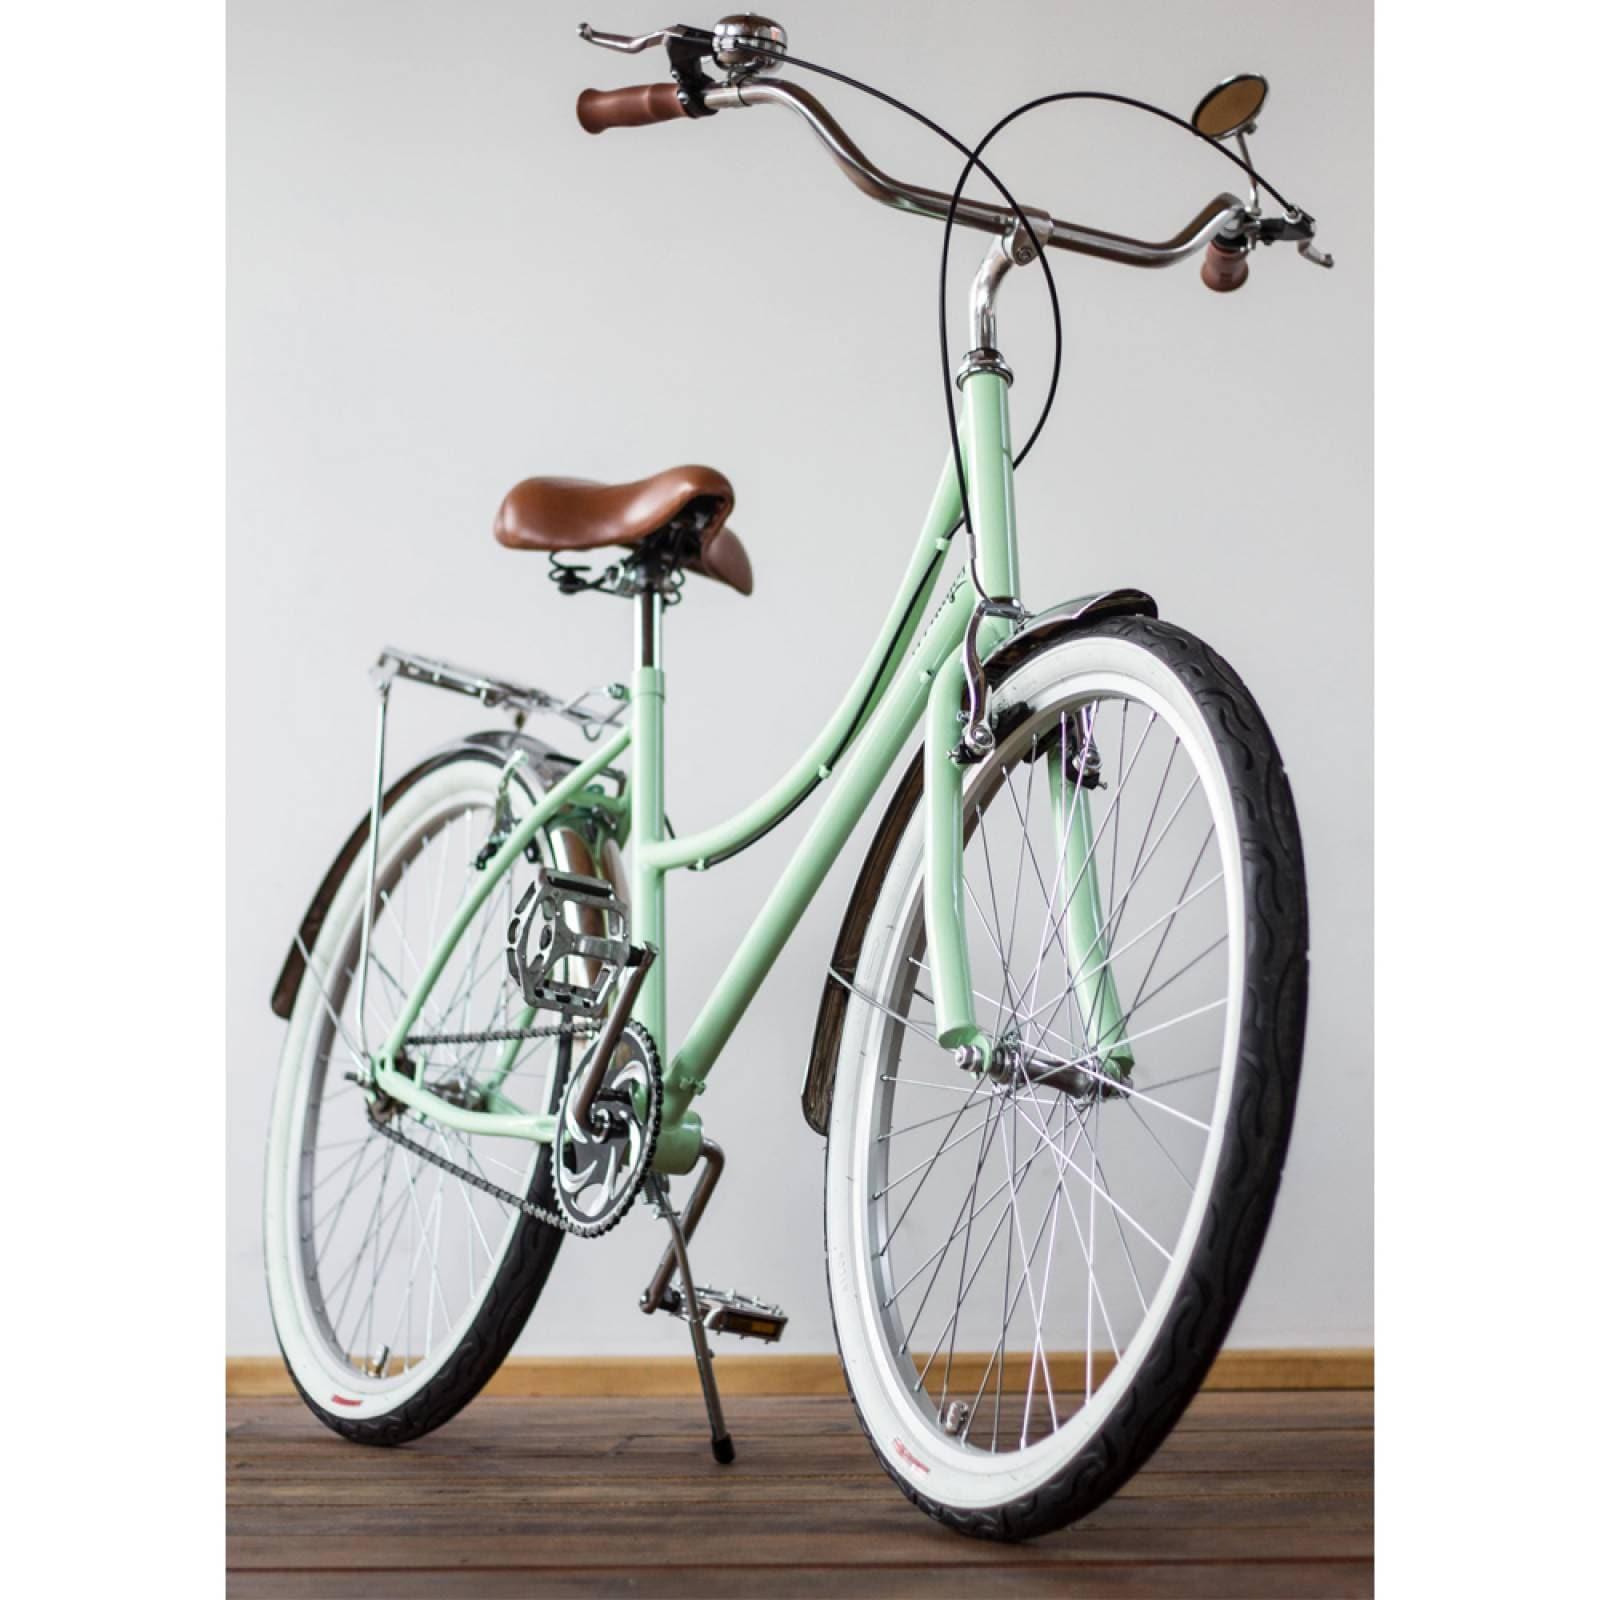 Bici Inglesa36 Rodada 26 Rines Acero Asiento Vinil 144 Rayos Bikes